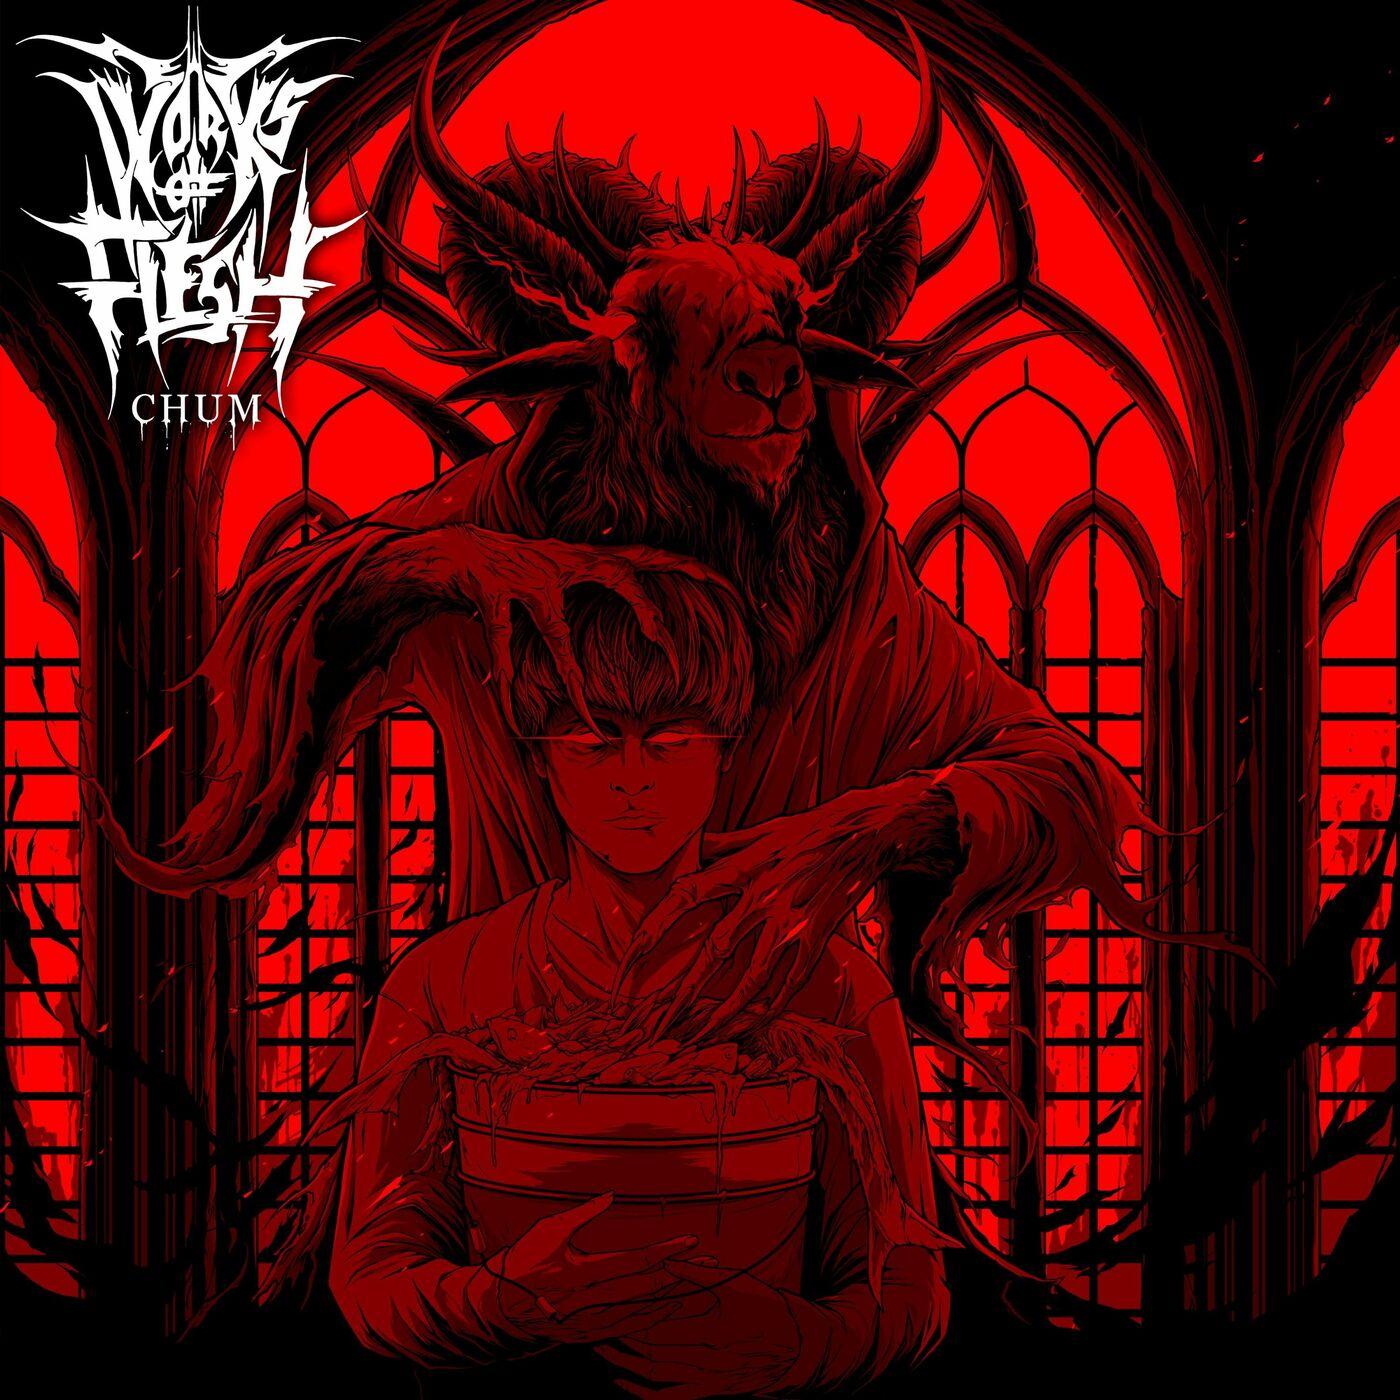 Works of Flesh - Chum [single] (2020)